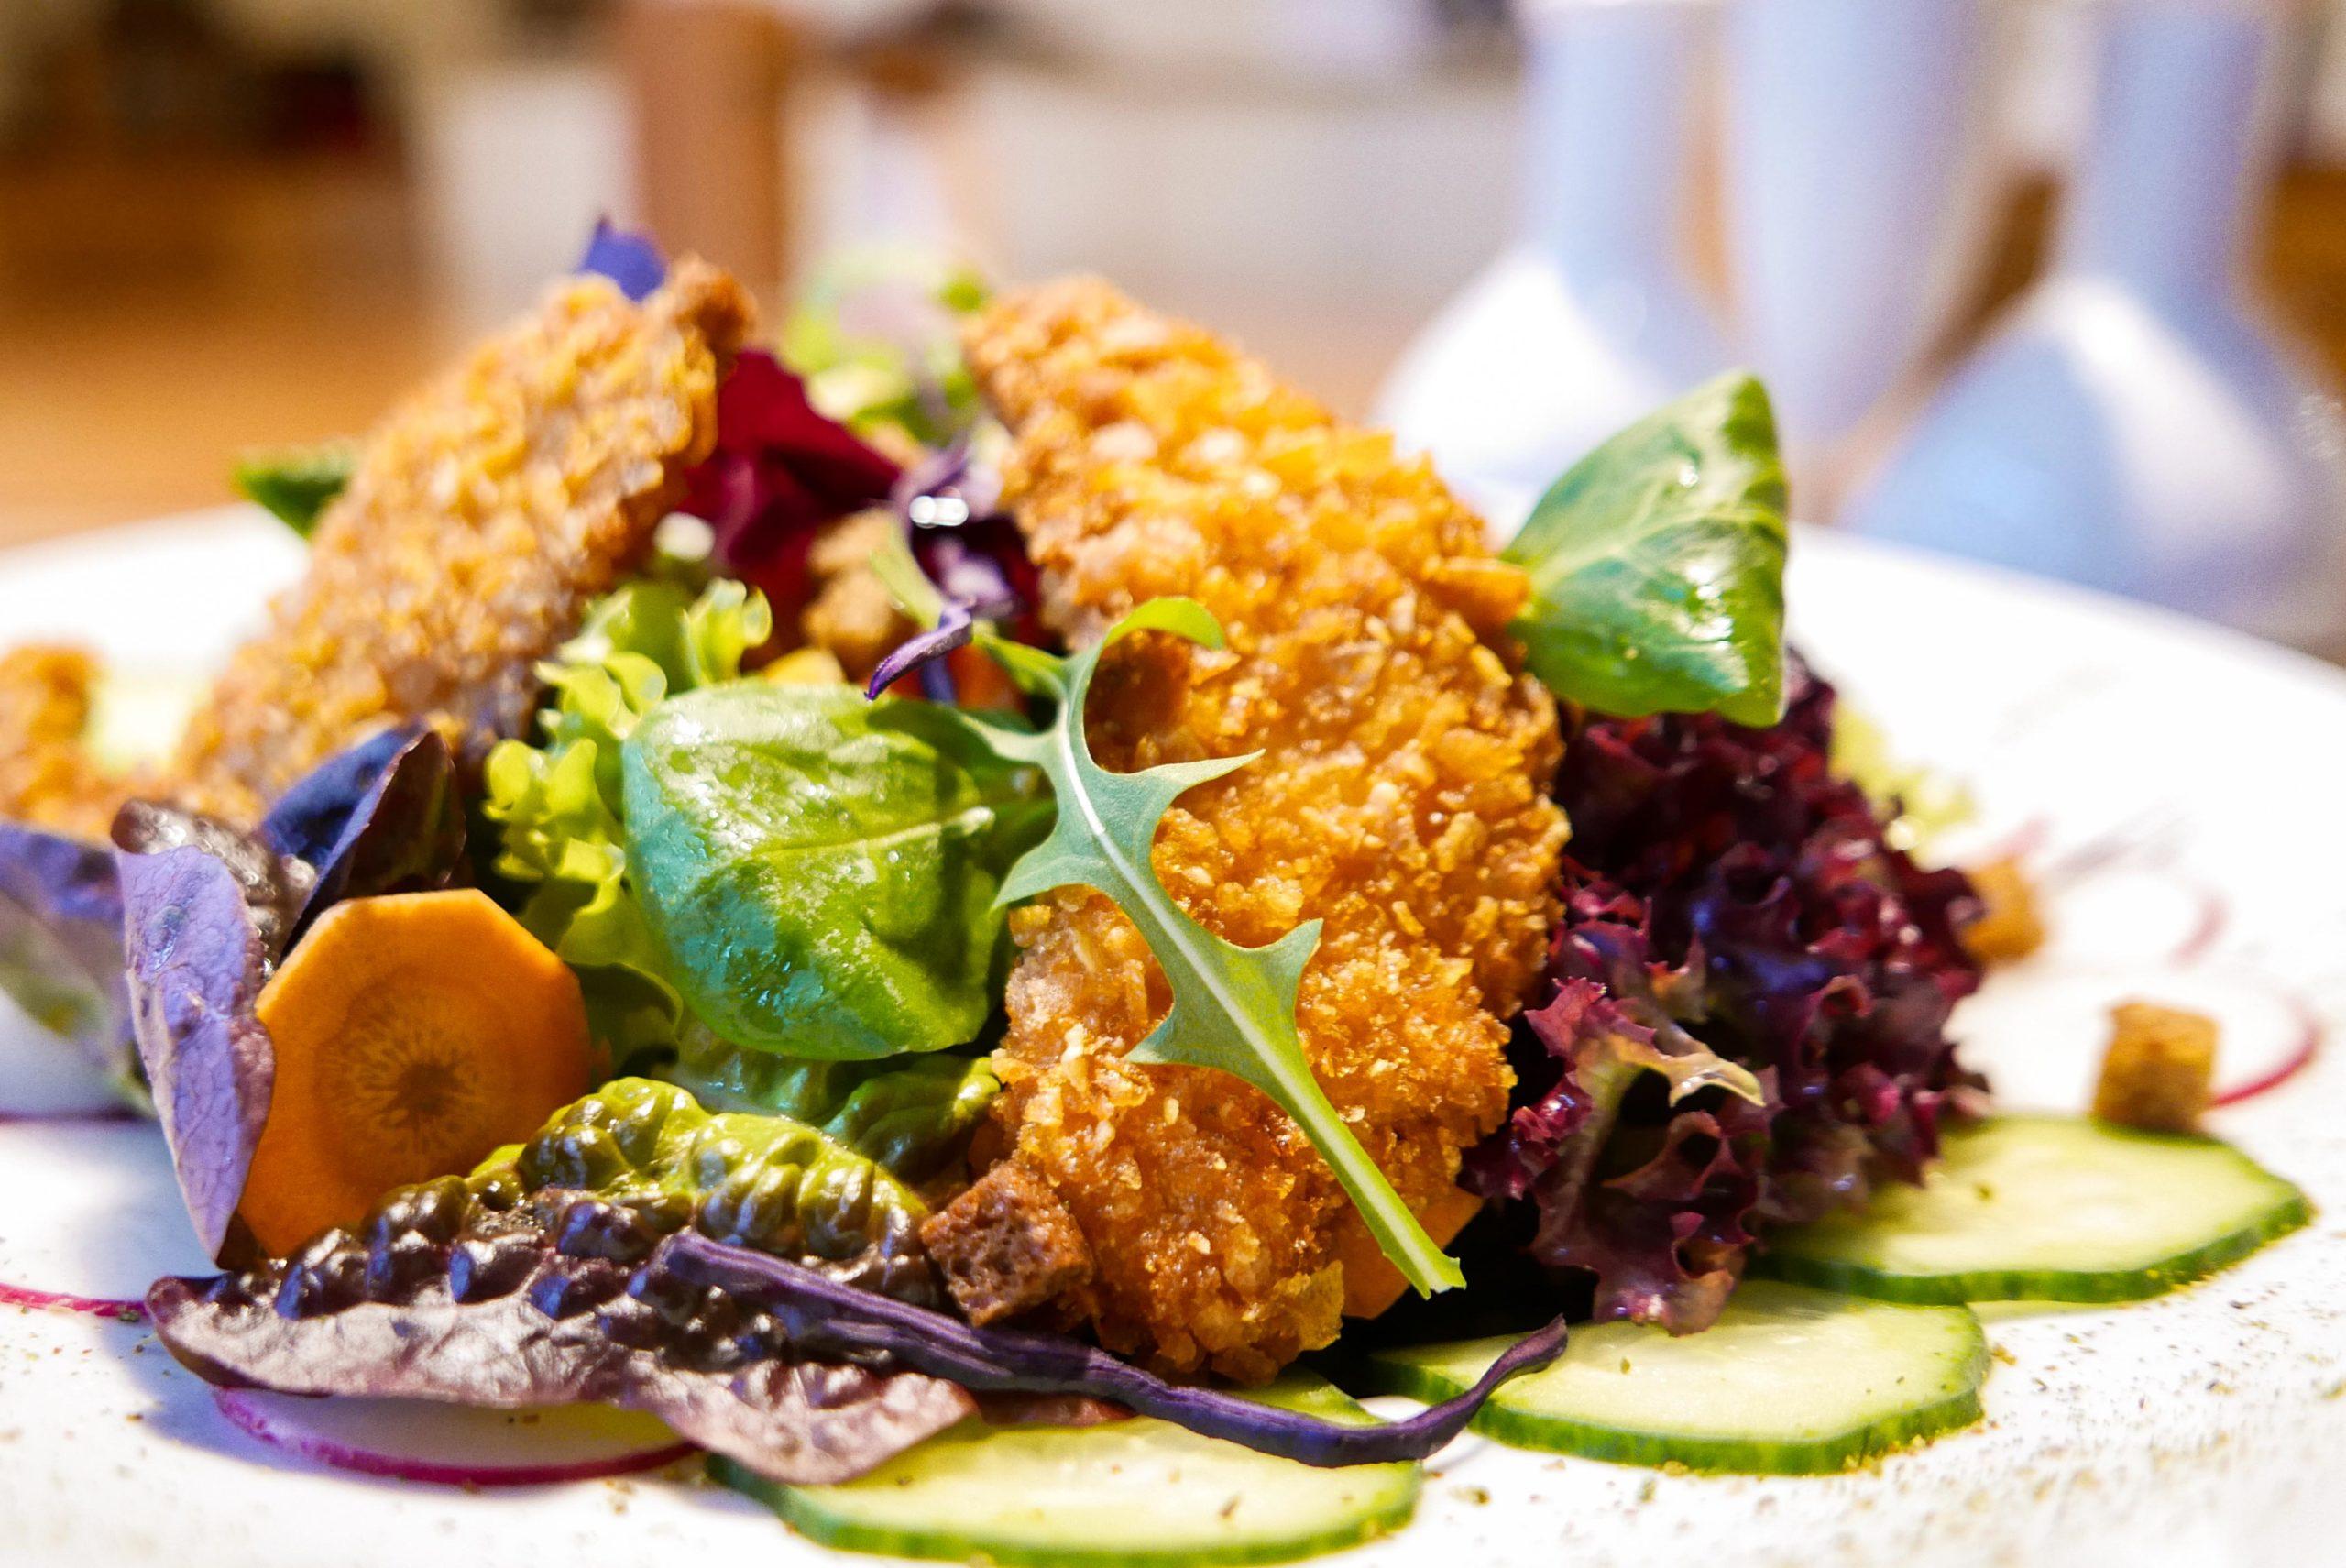 Inn4tler Salatteller mit gebackener Hendlbrust in der Maiskruste